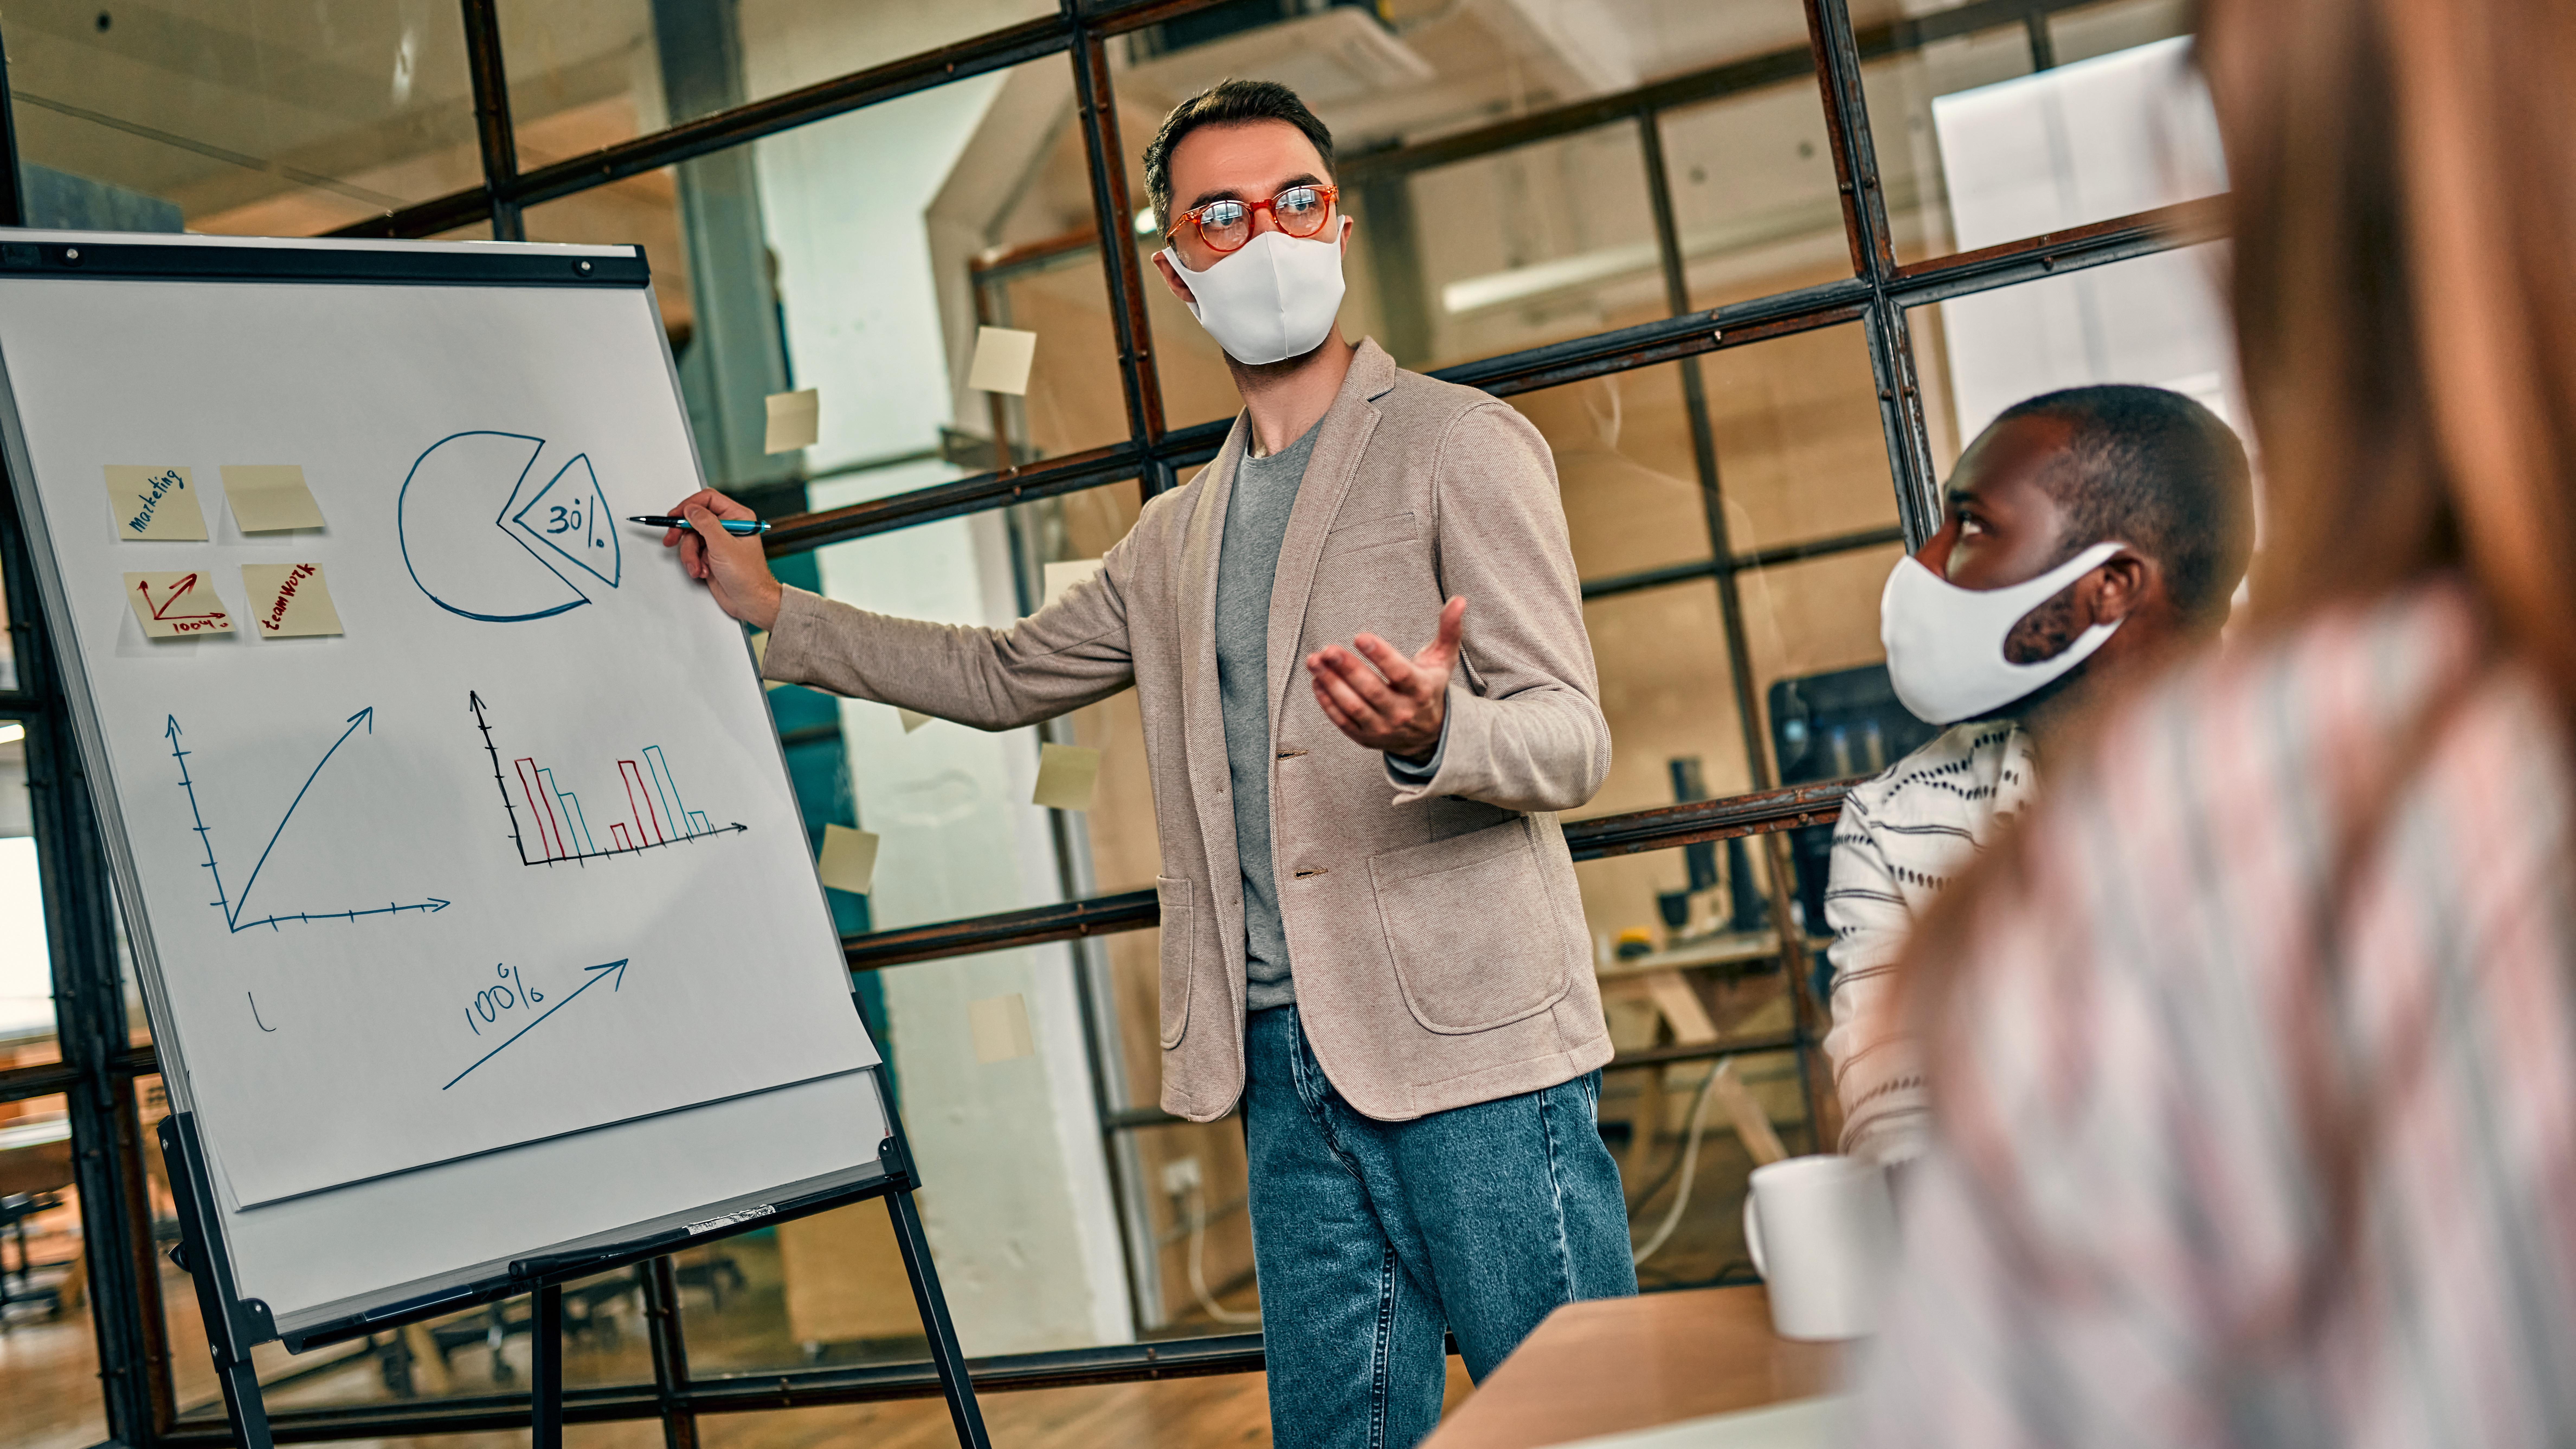 Hybrid Workplace Brainstorm Session